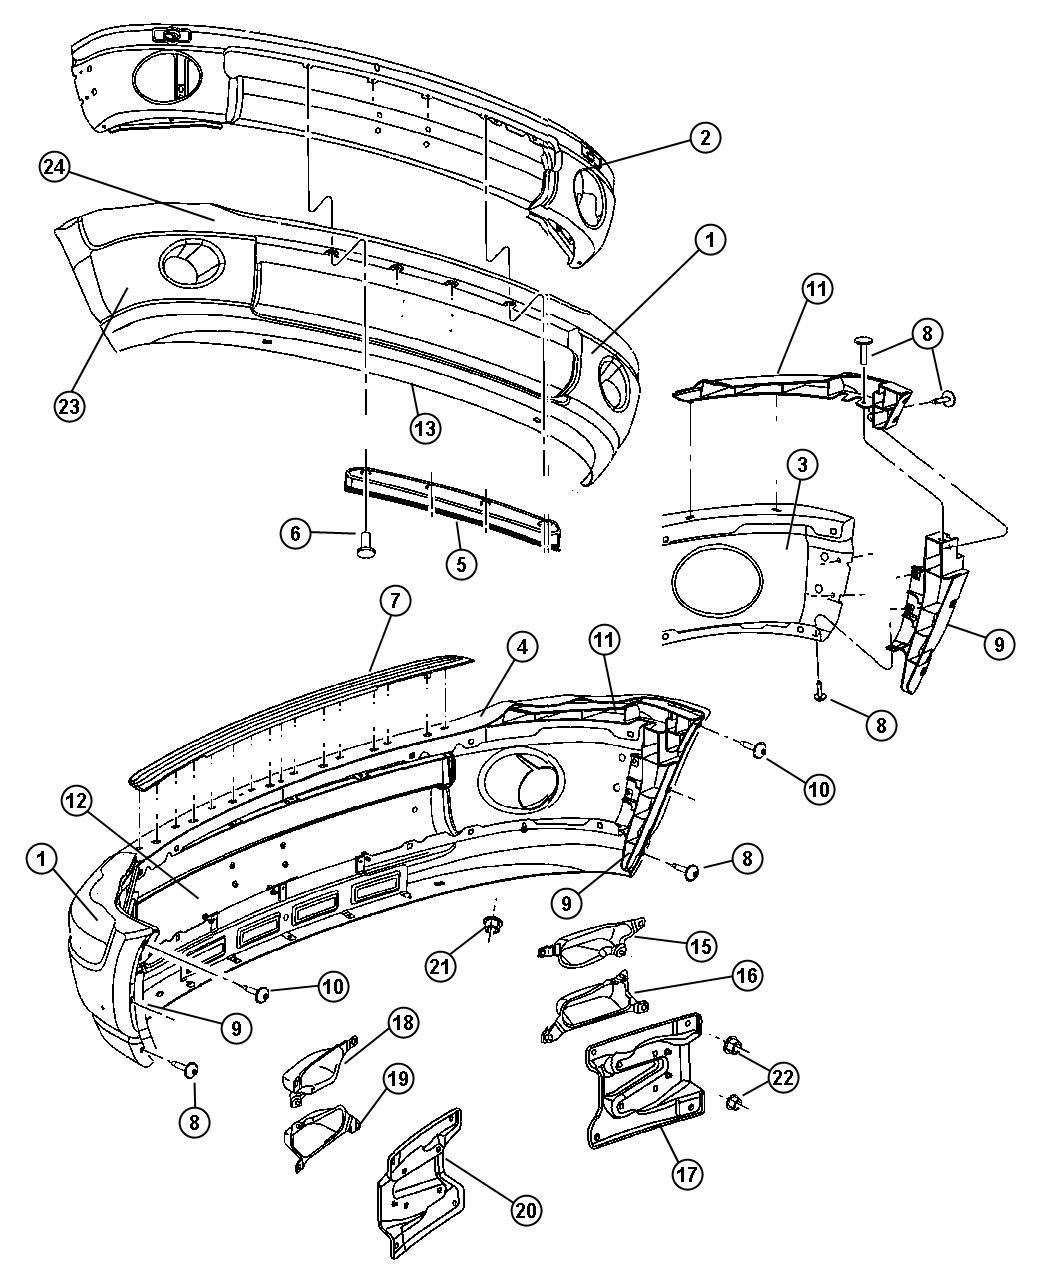 2005 chevy equinox suspension diagram create sequence visual studio gmc terrain front bumper parts imageresizertool com